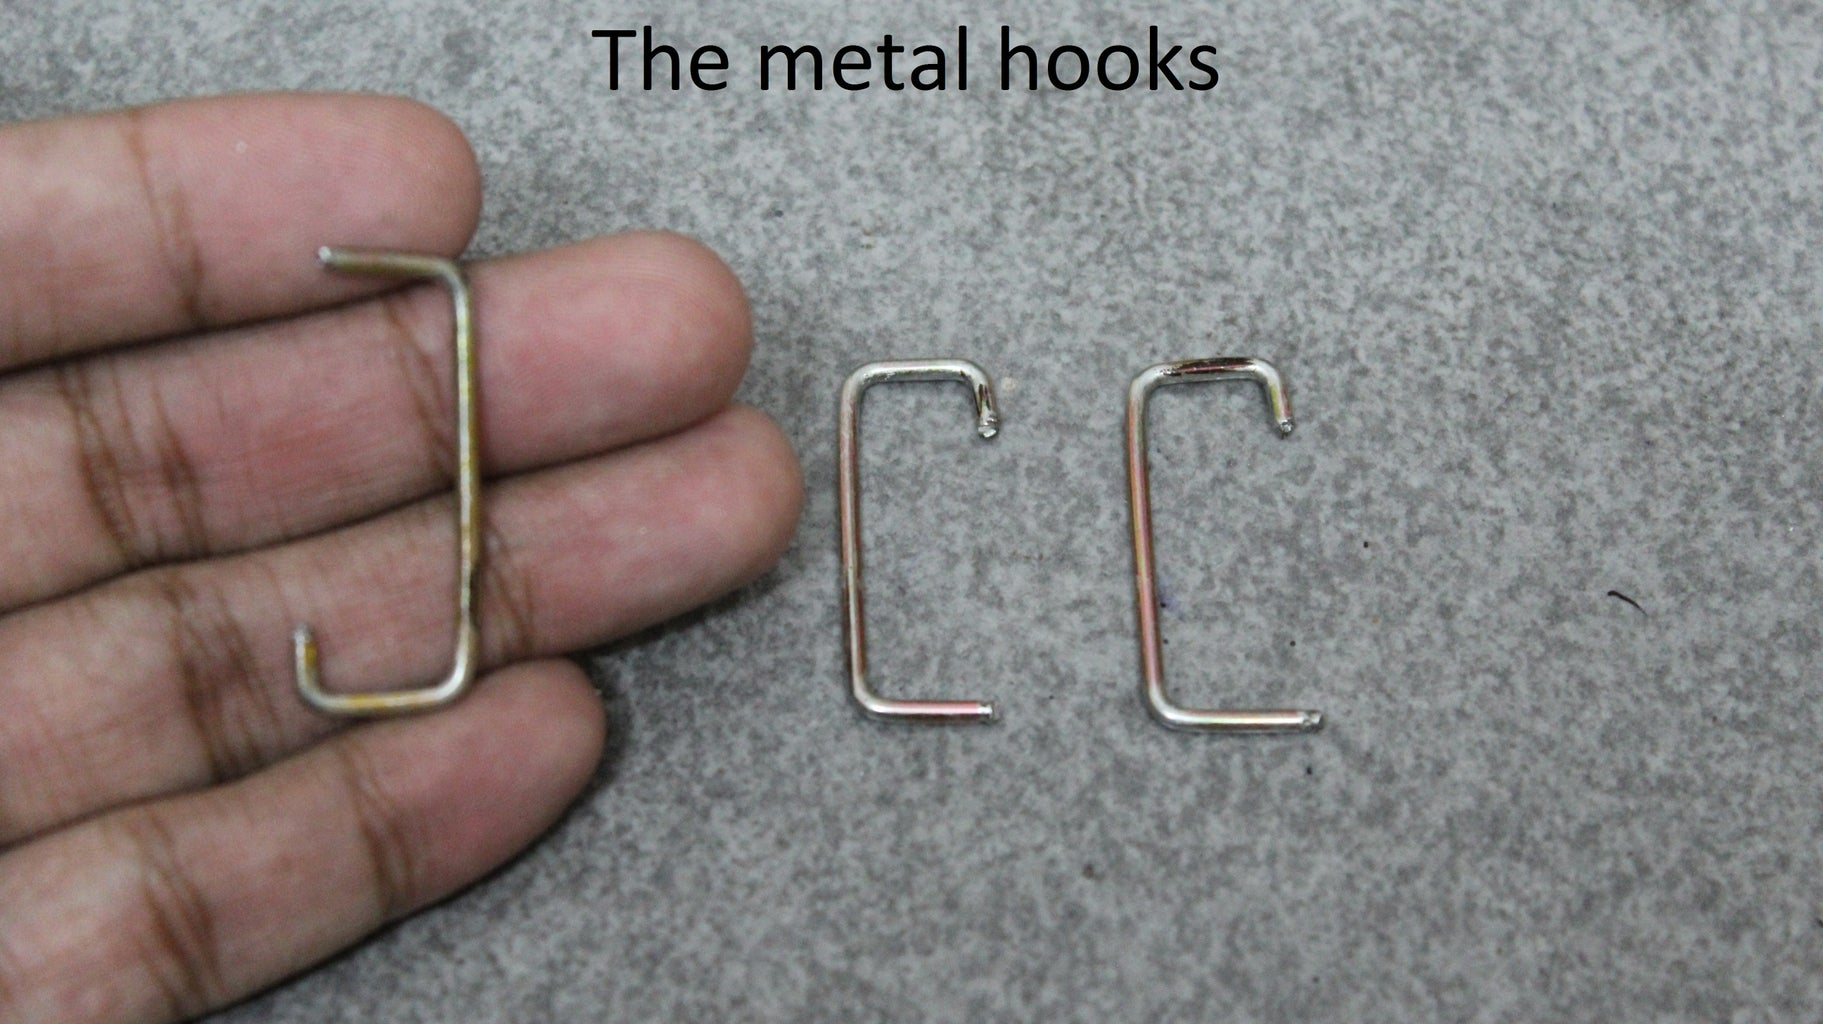 The Metal Hooks & Heat Sink Pieces